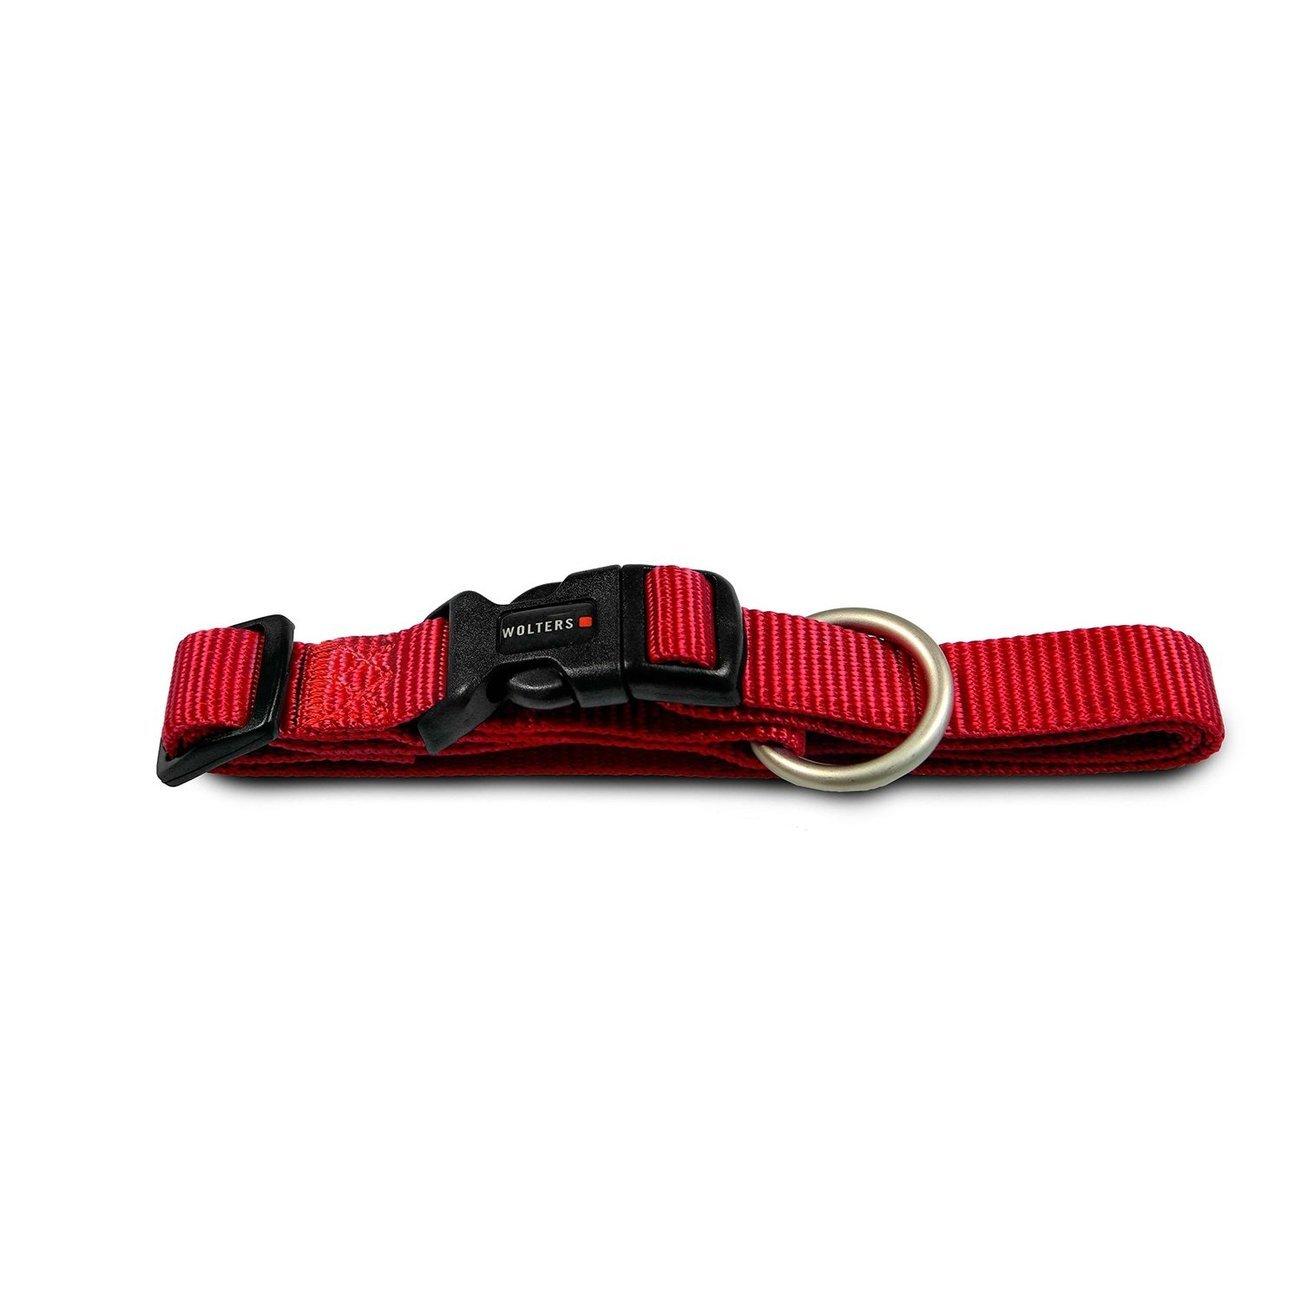 Wolters Halsband Nylon Professional, Bild 5